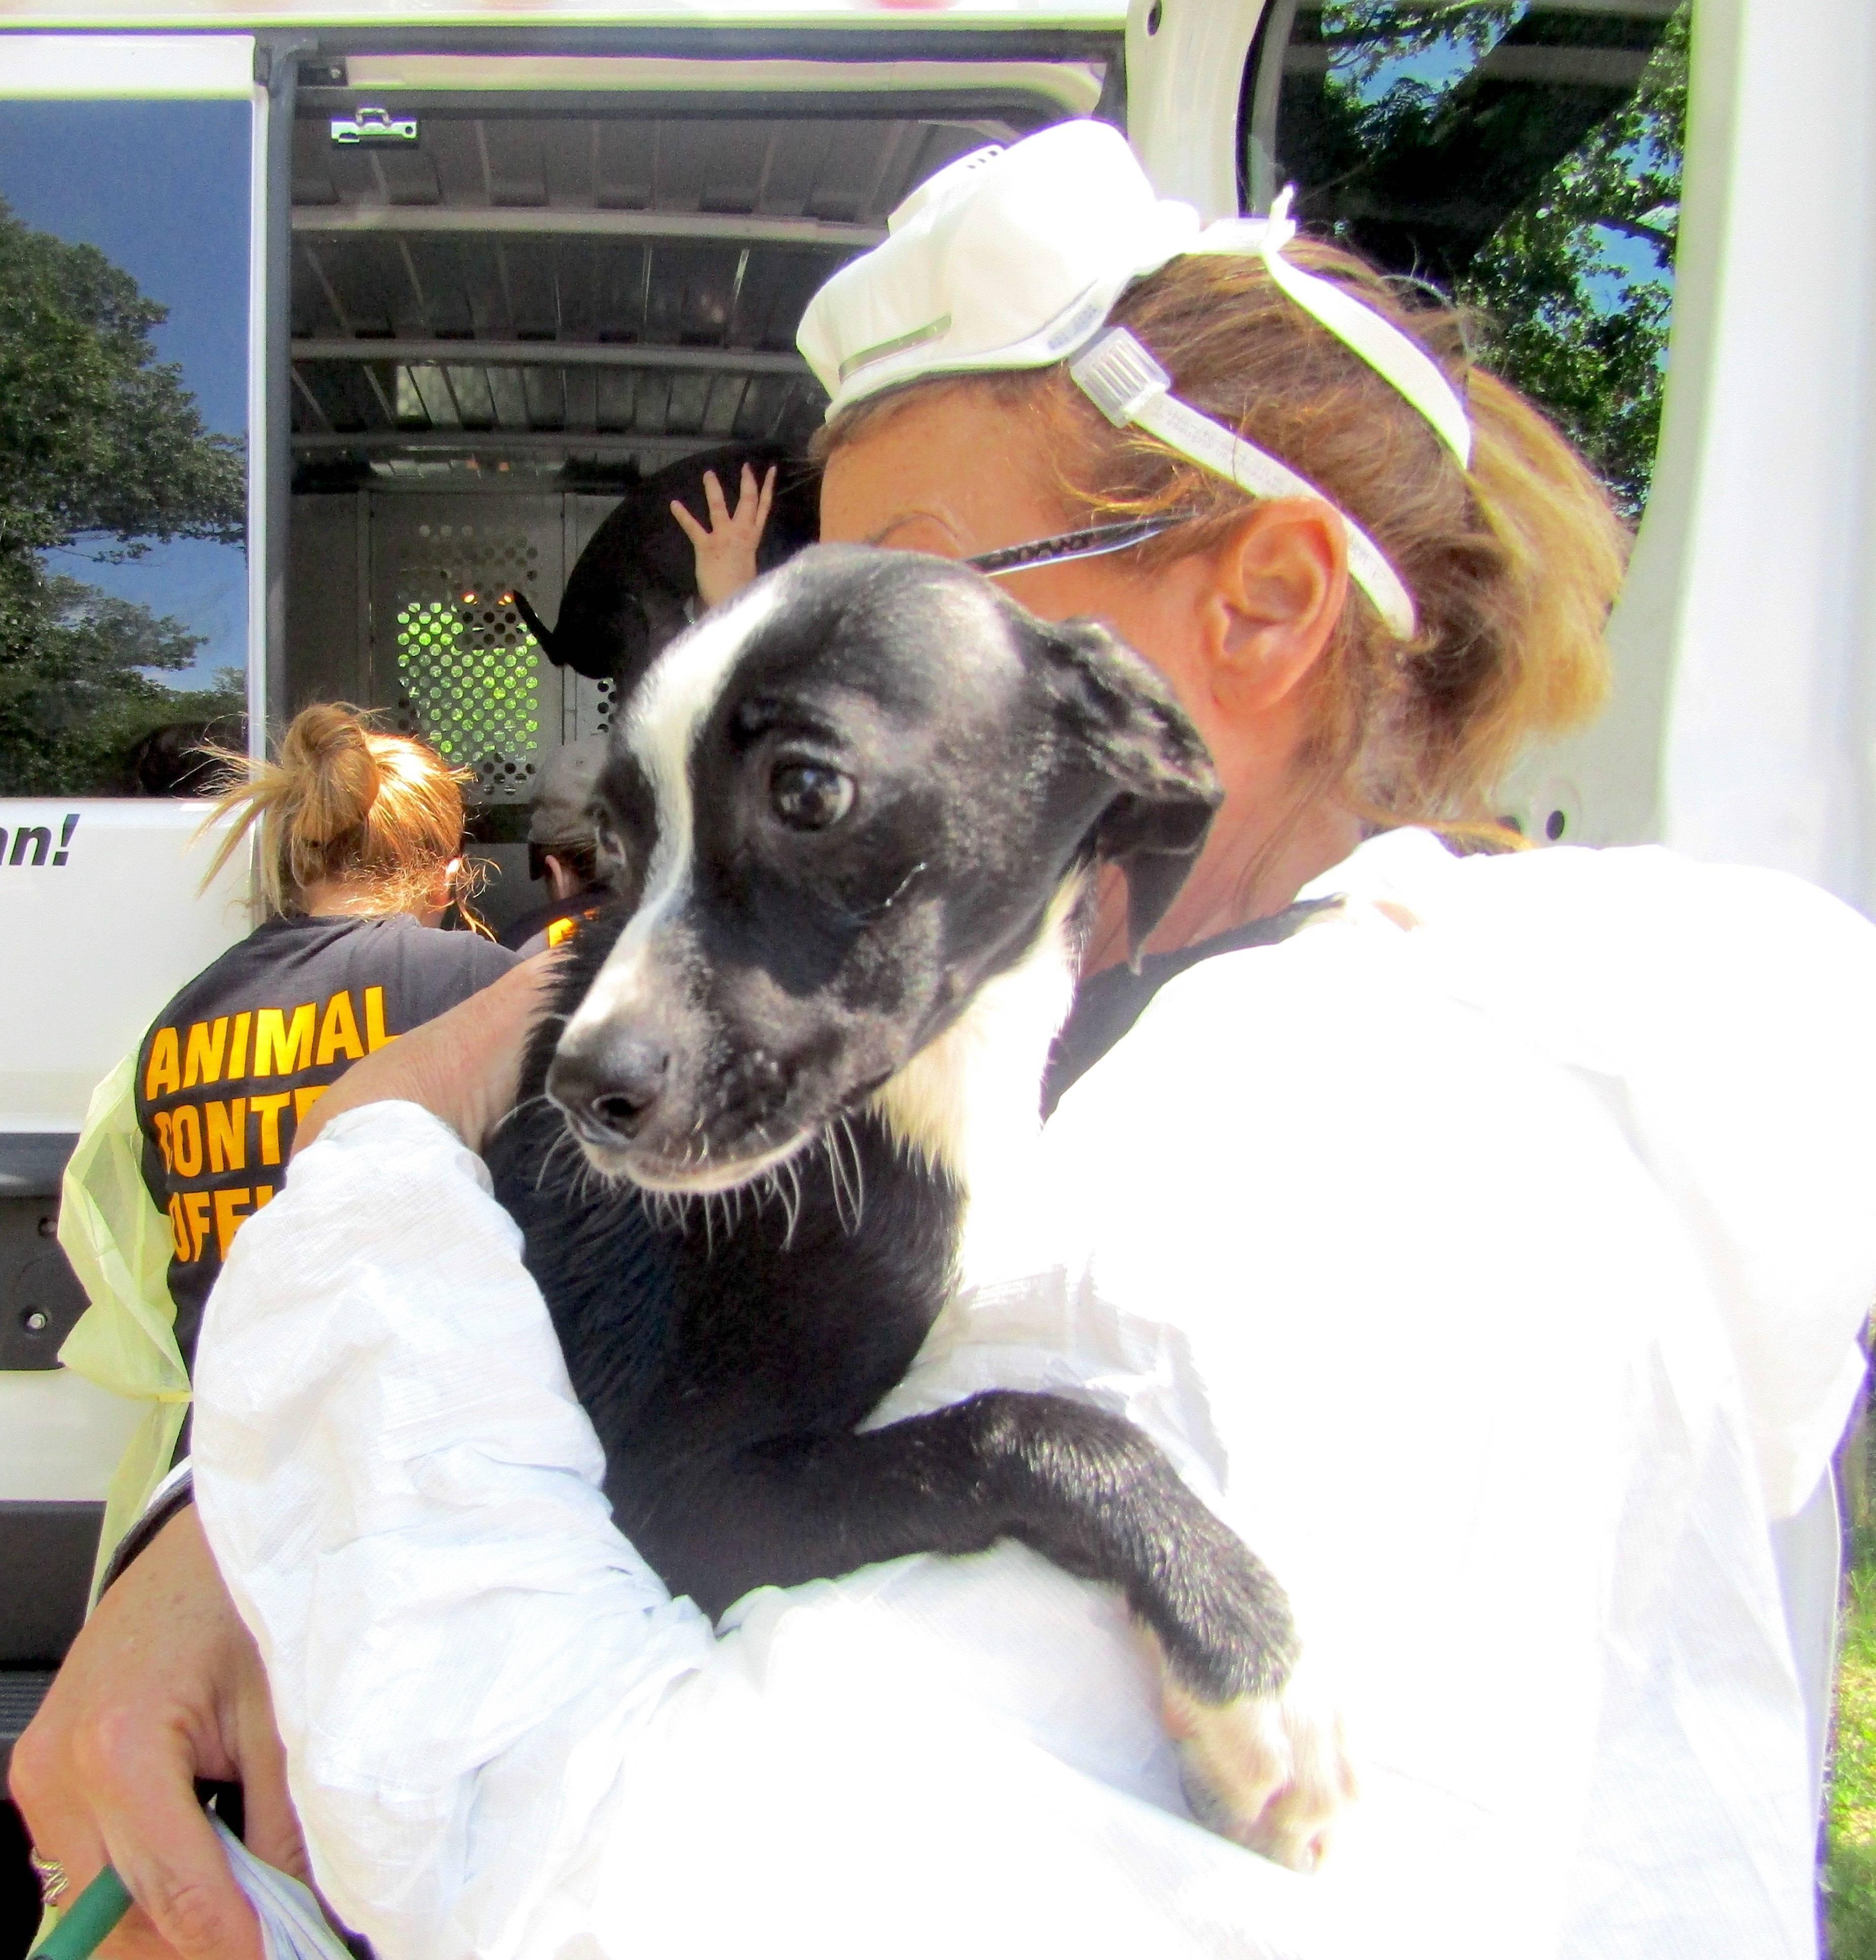 425e62b415a4828962f9_cb383b6417f549800e76_8162ccf60c700e3c3829_Roselle_animal_cruelty_case_3.JPG